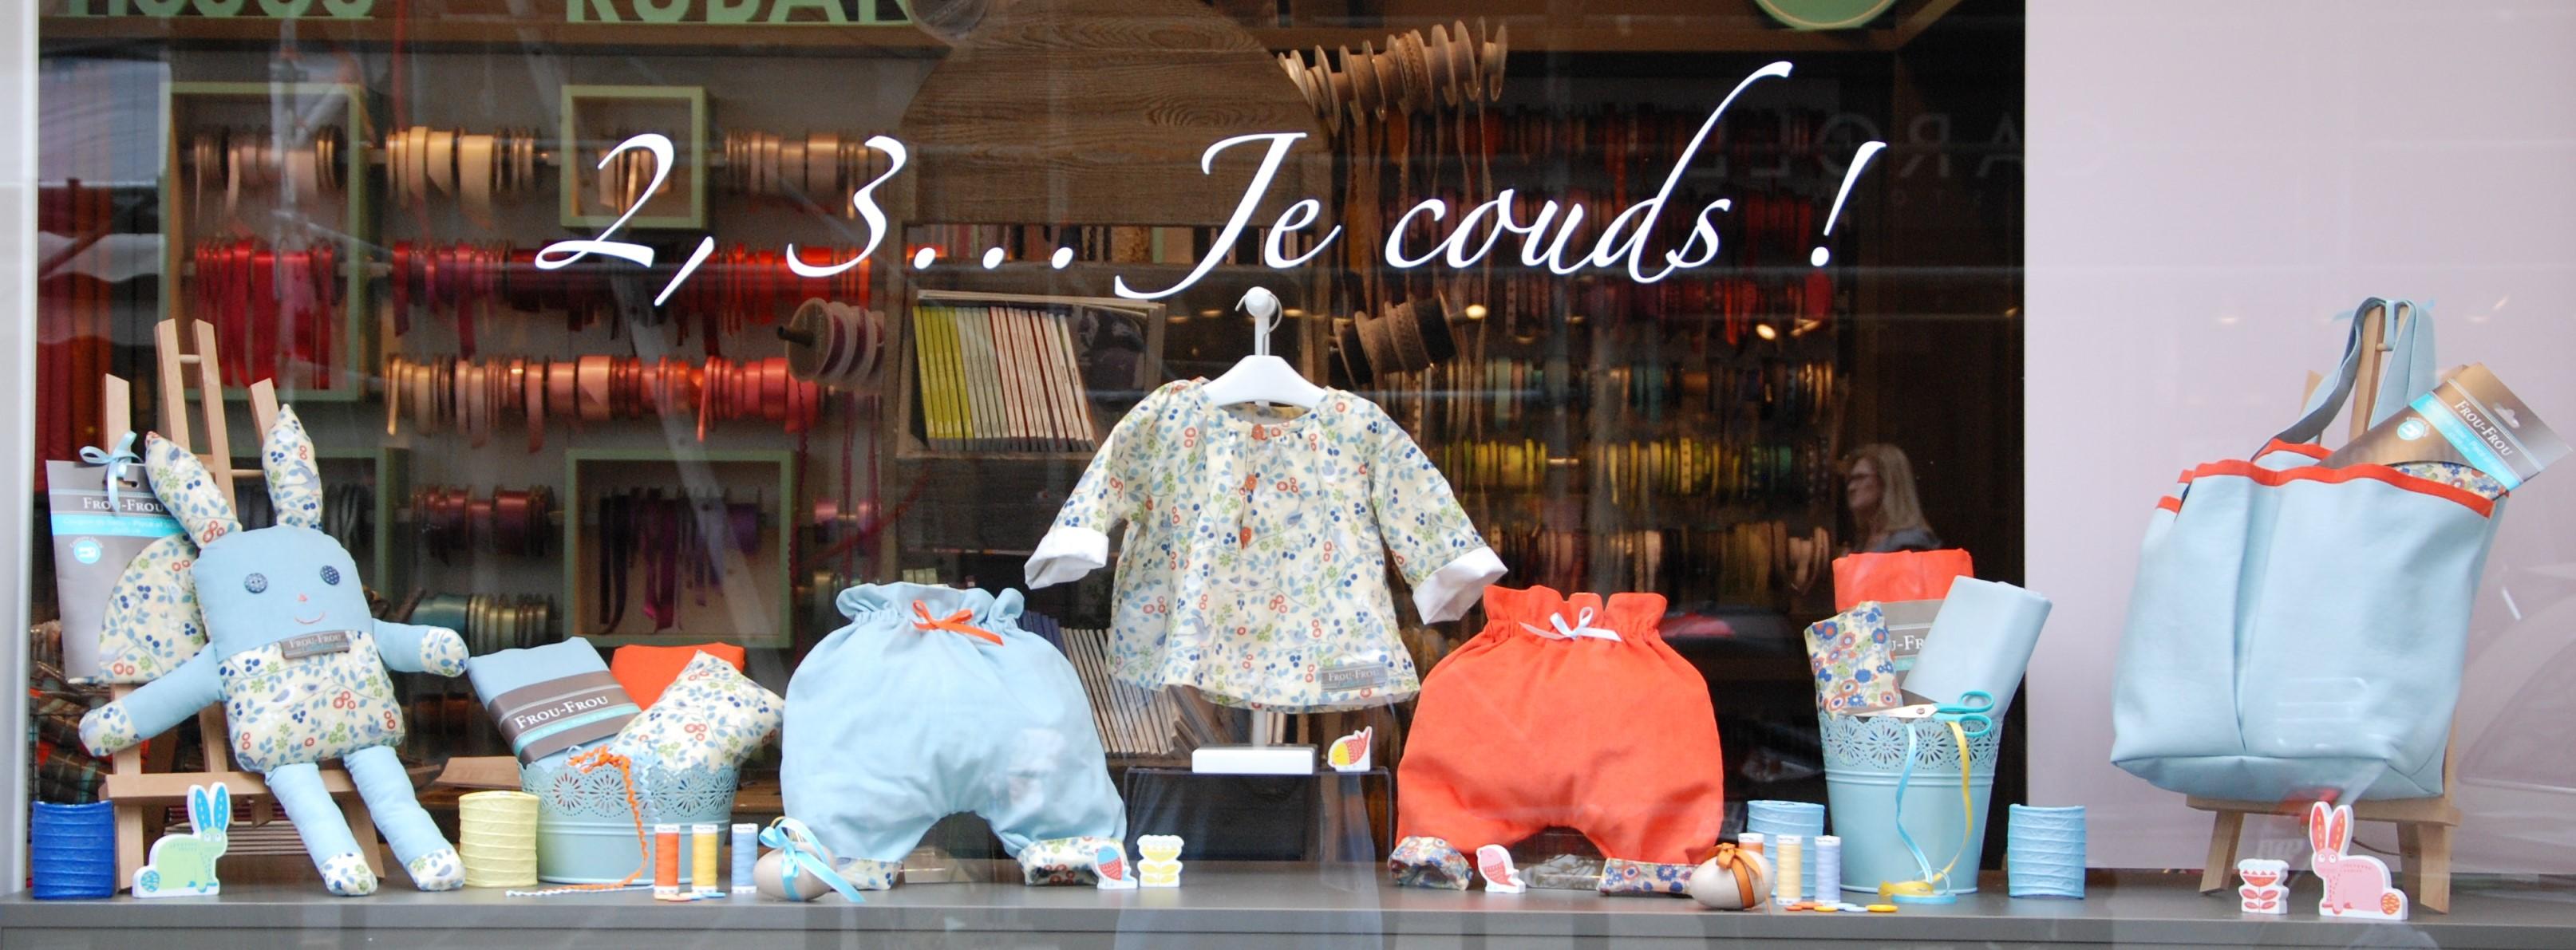 vitrine Frou-Frou